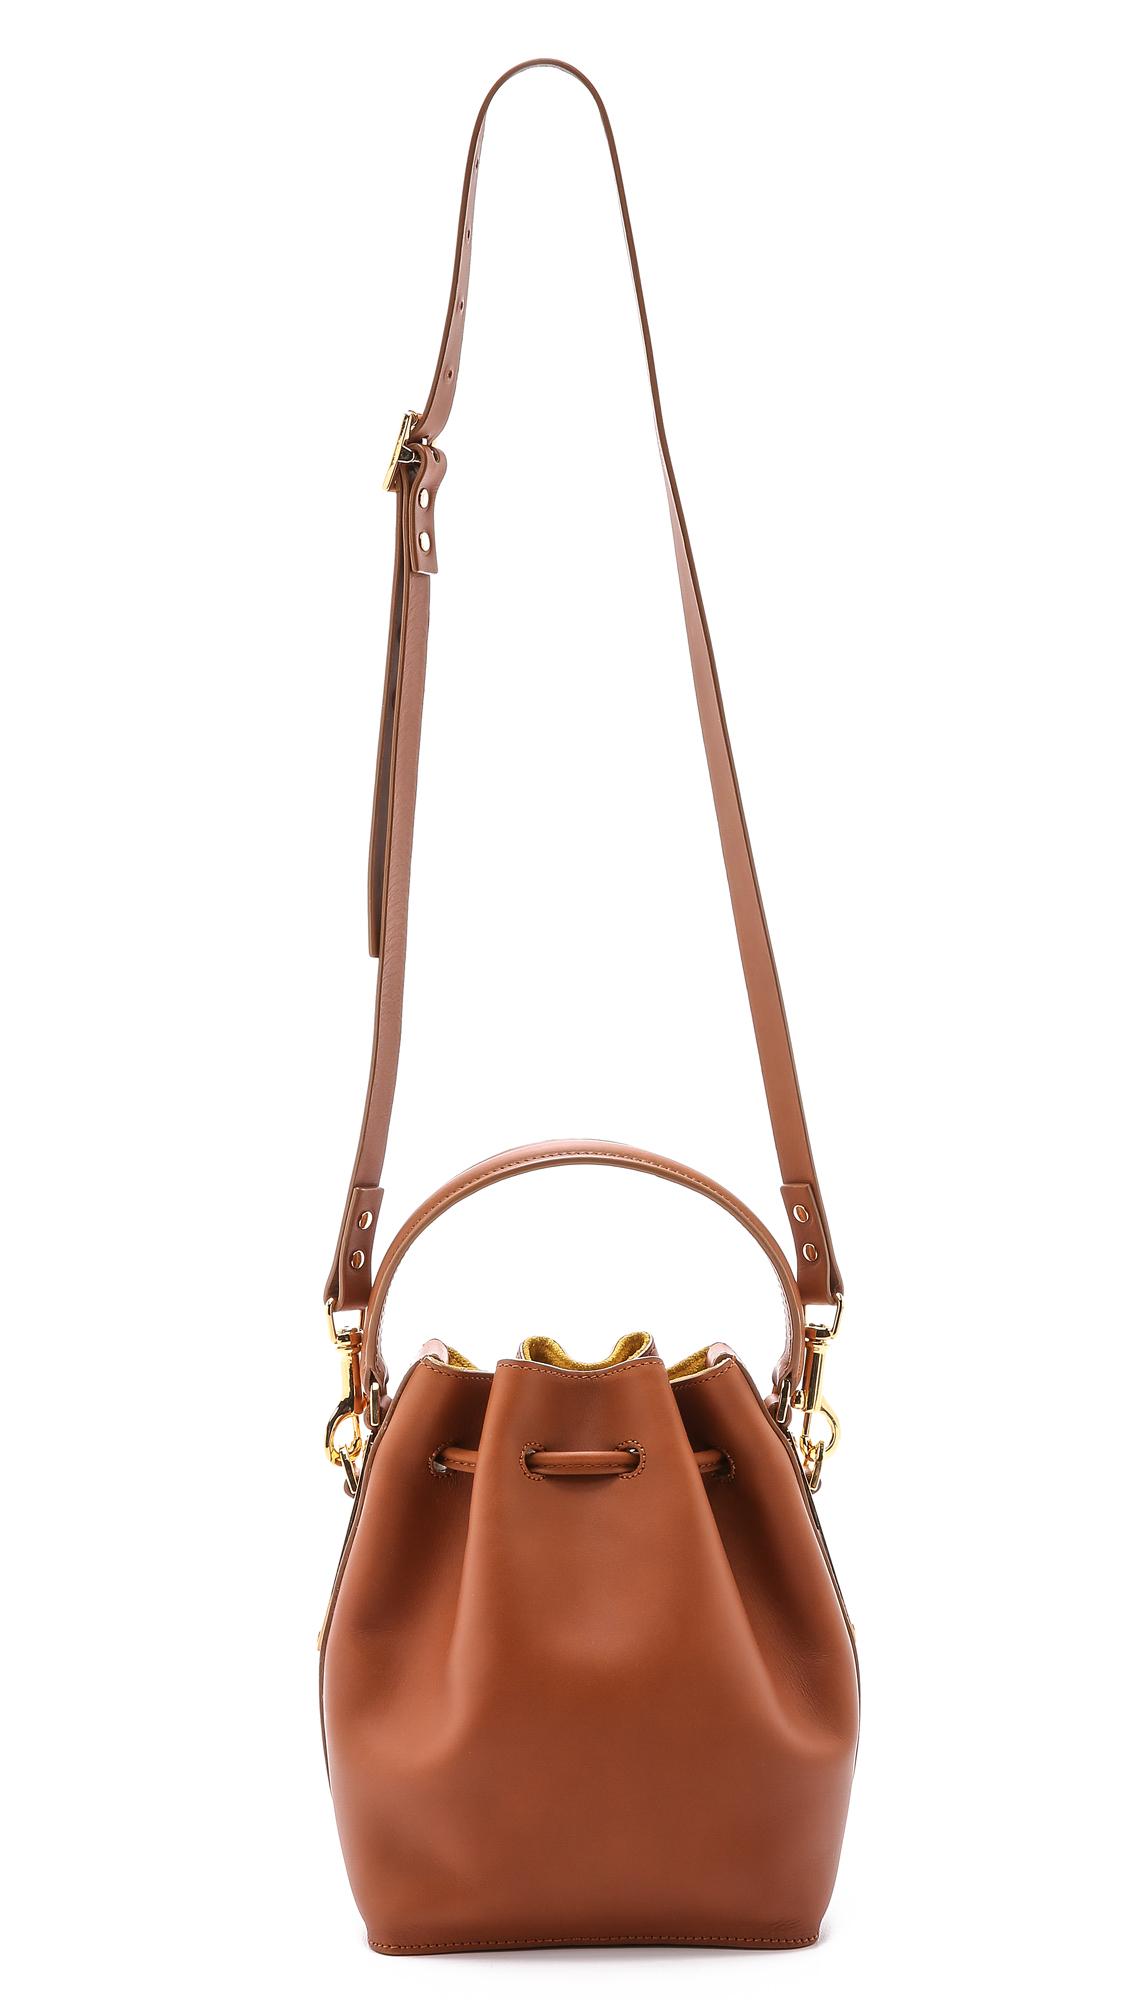 Sophie hulme Small Drawstring Bucket Bag in Brown   Lyst